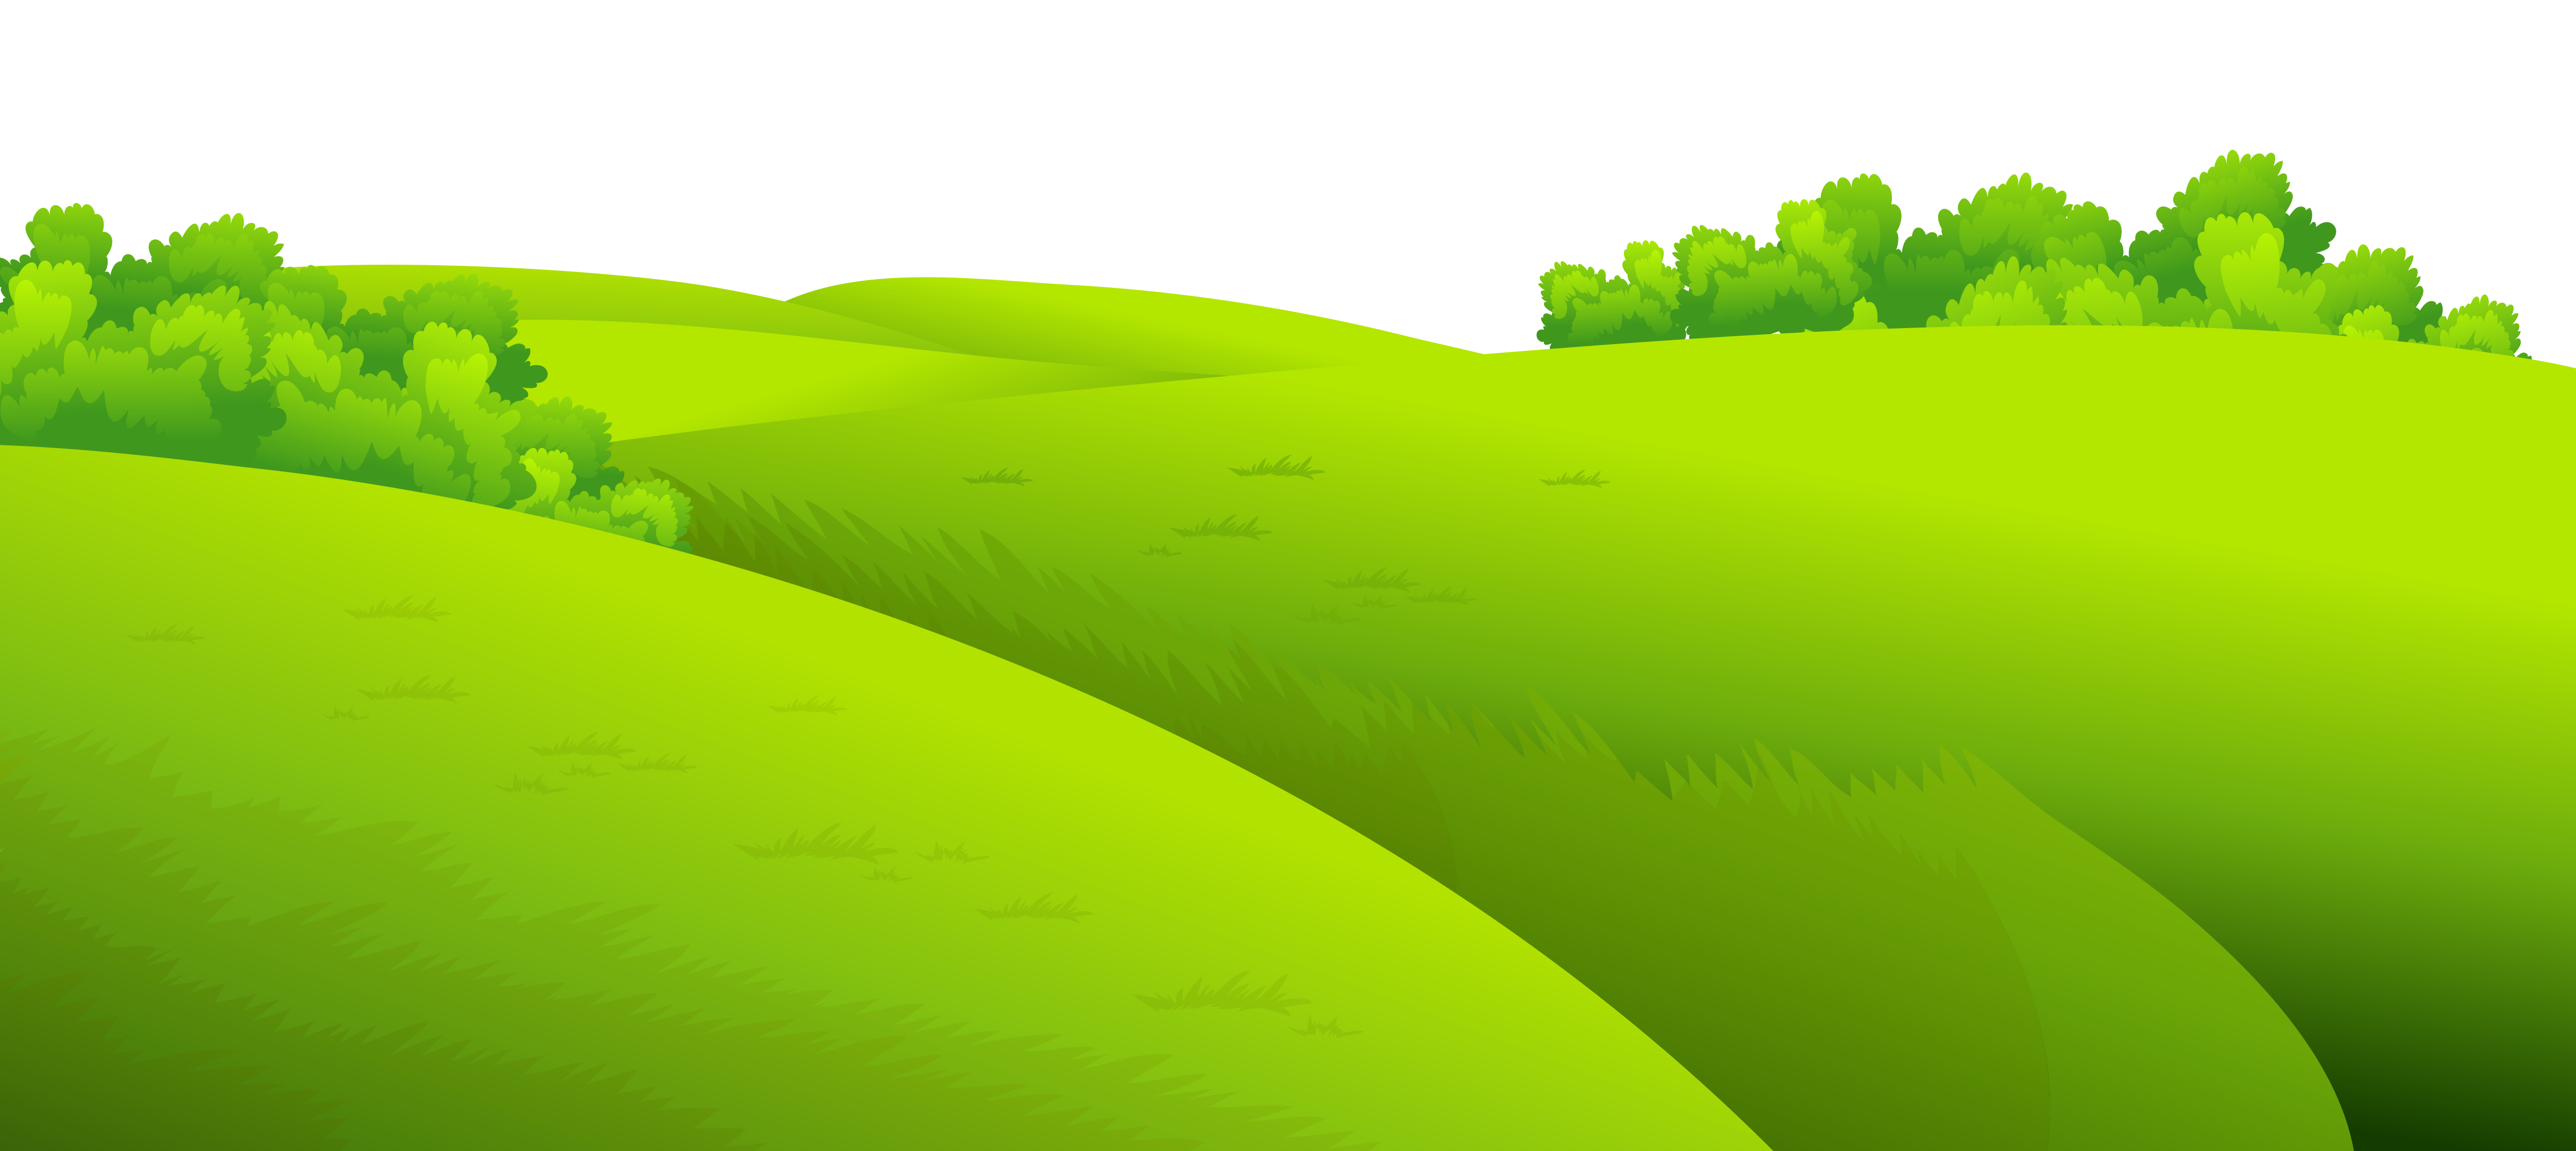 Hills clipart grass mound, Picture #1339631 hills clipart.